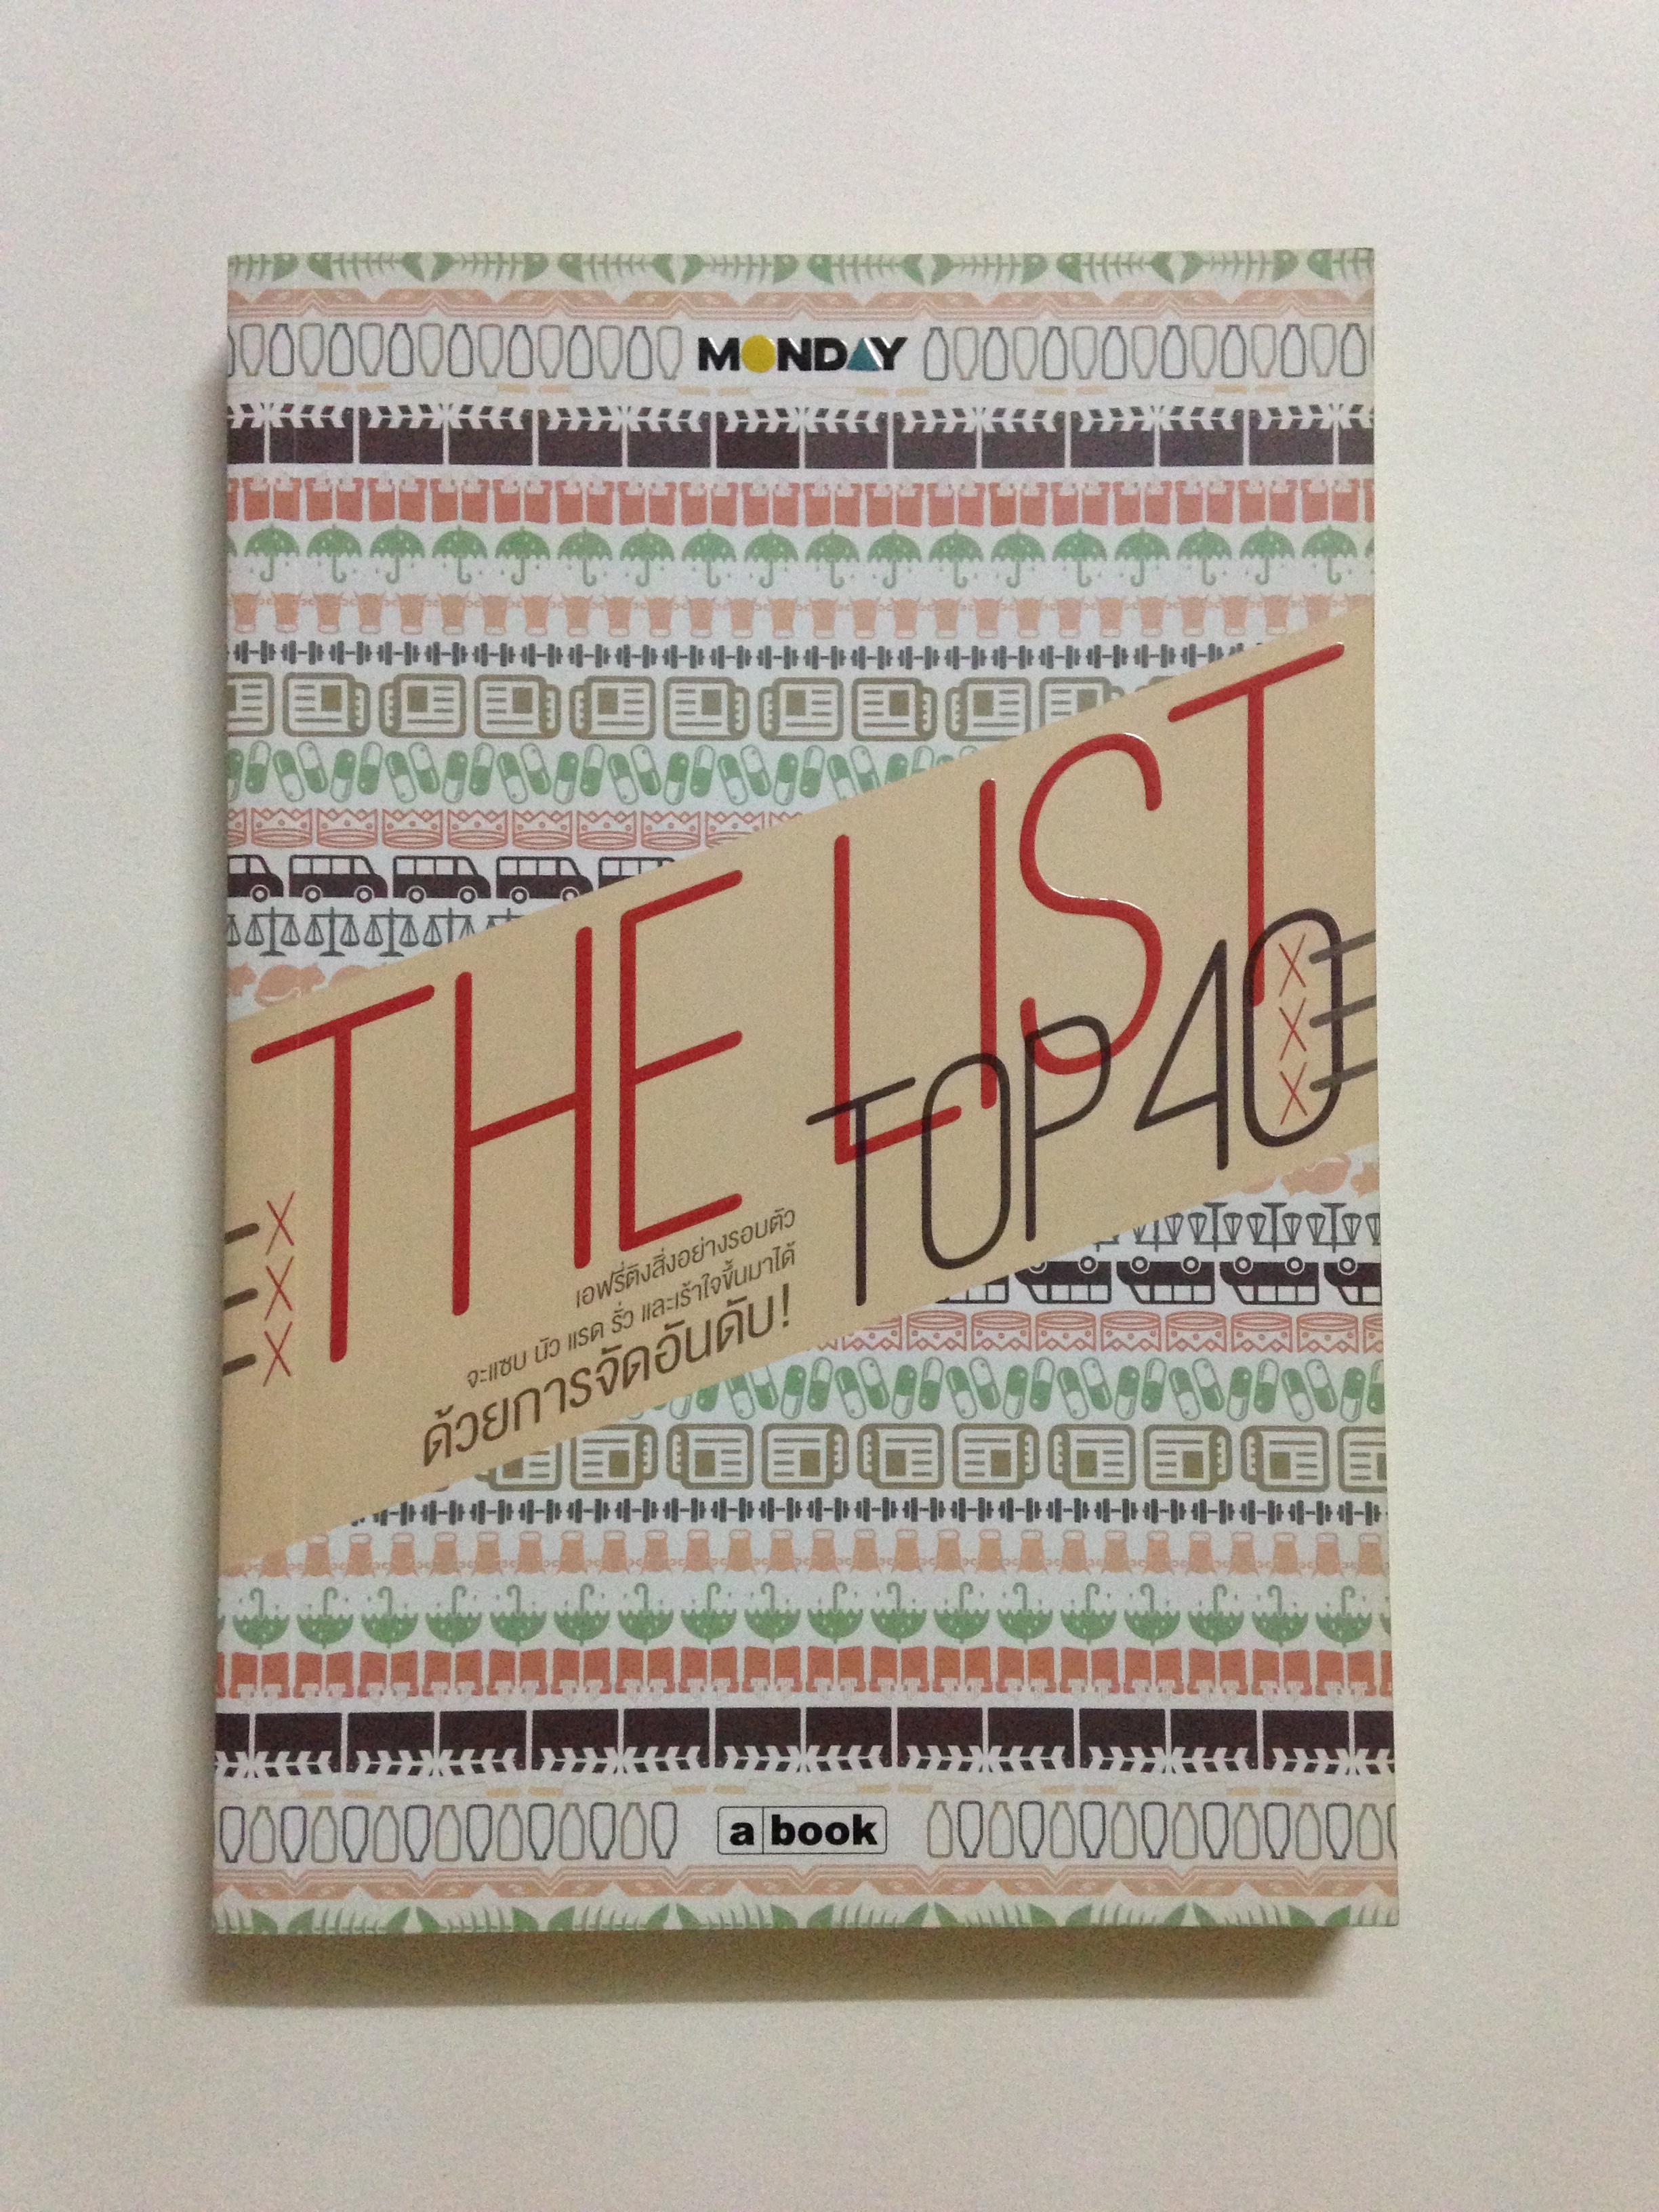 Monday Paper Vol.04 : The List / ทาเคชิ